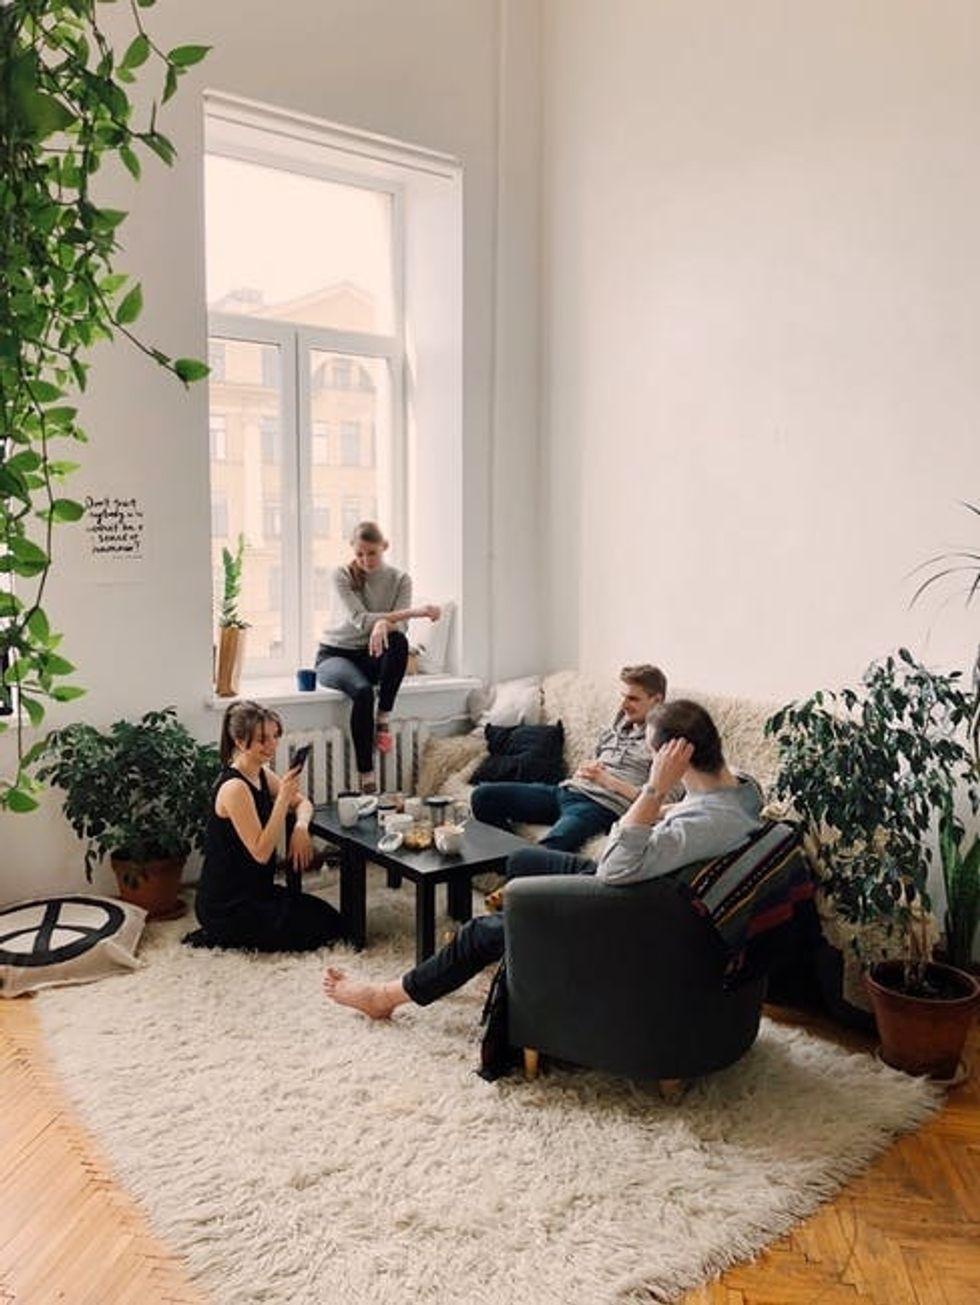 https://www.pexels.com/photo/people-gathered-inside-house-sitting-on-sofa-1054974/